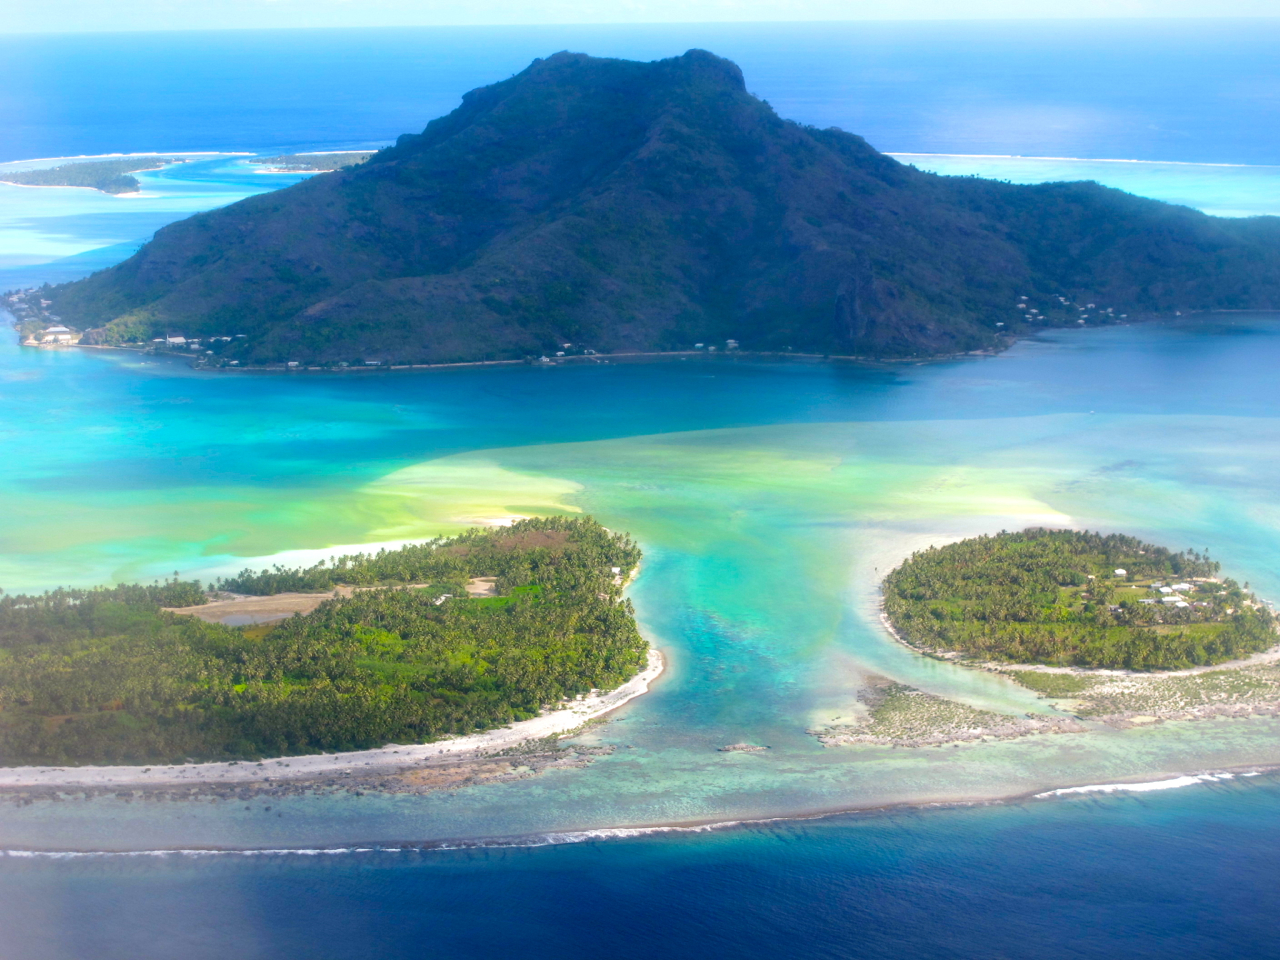 Bora Bora 6 aerial photograph